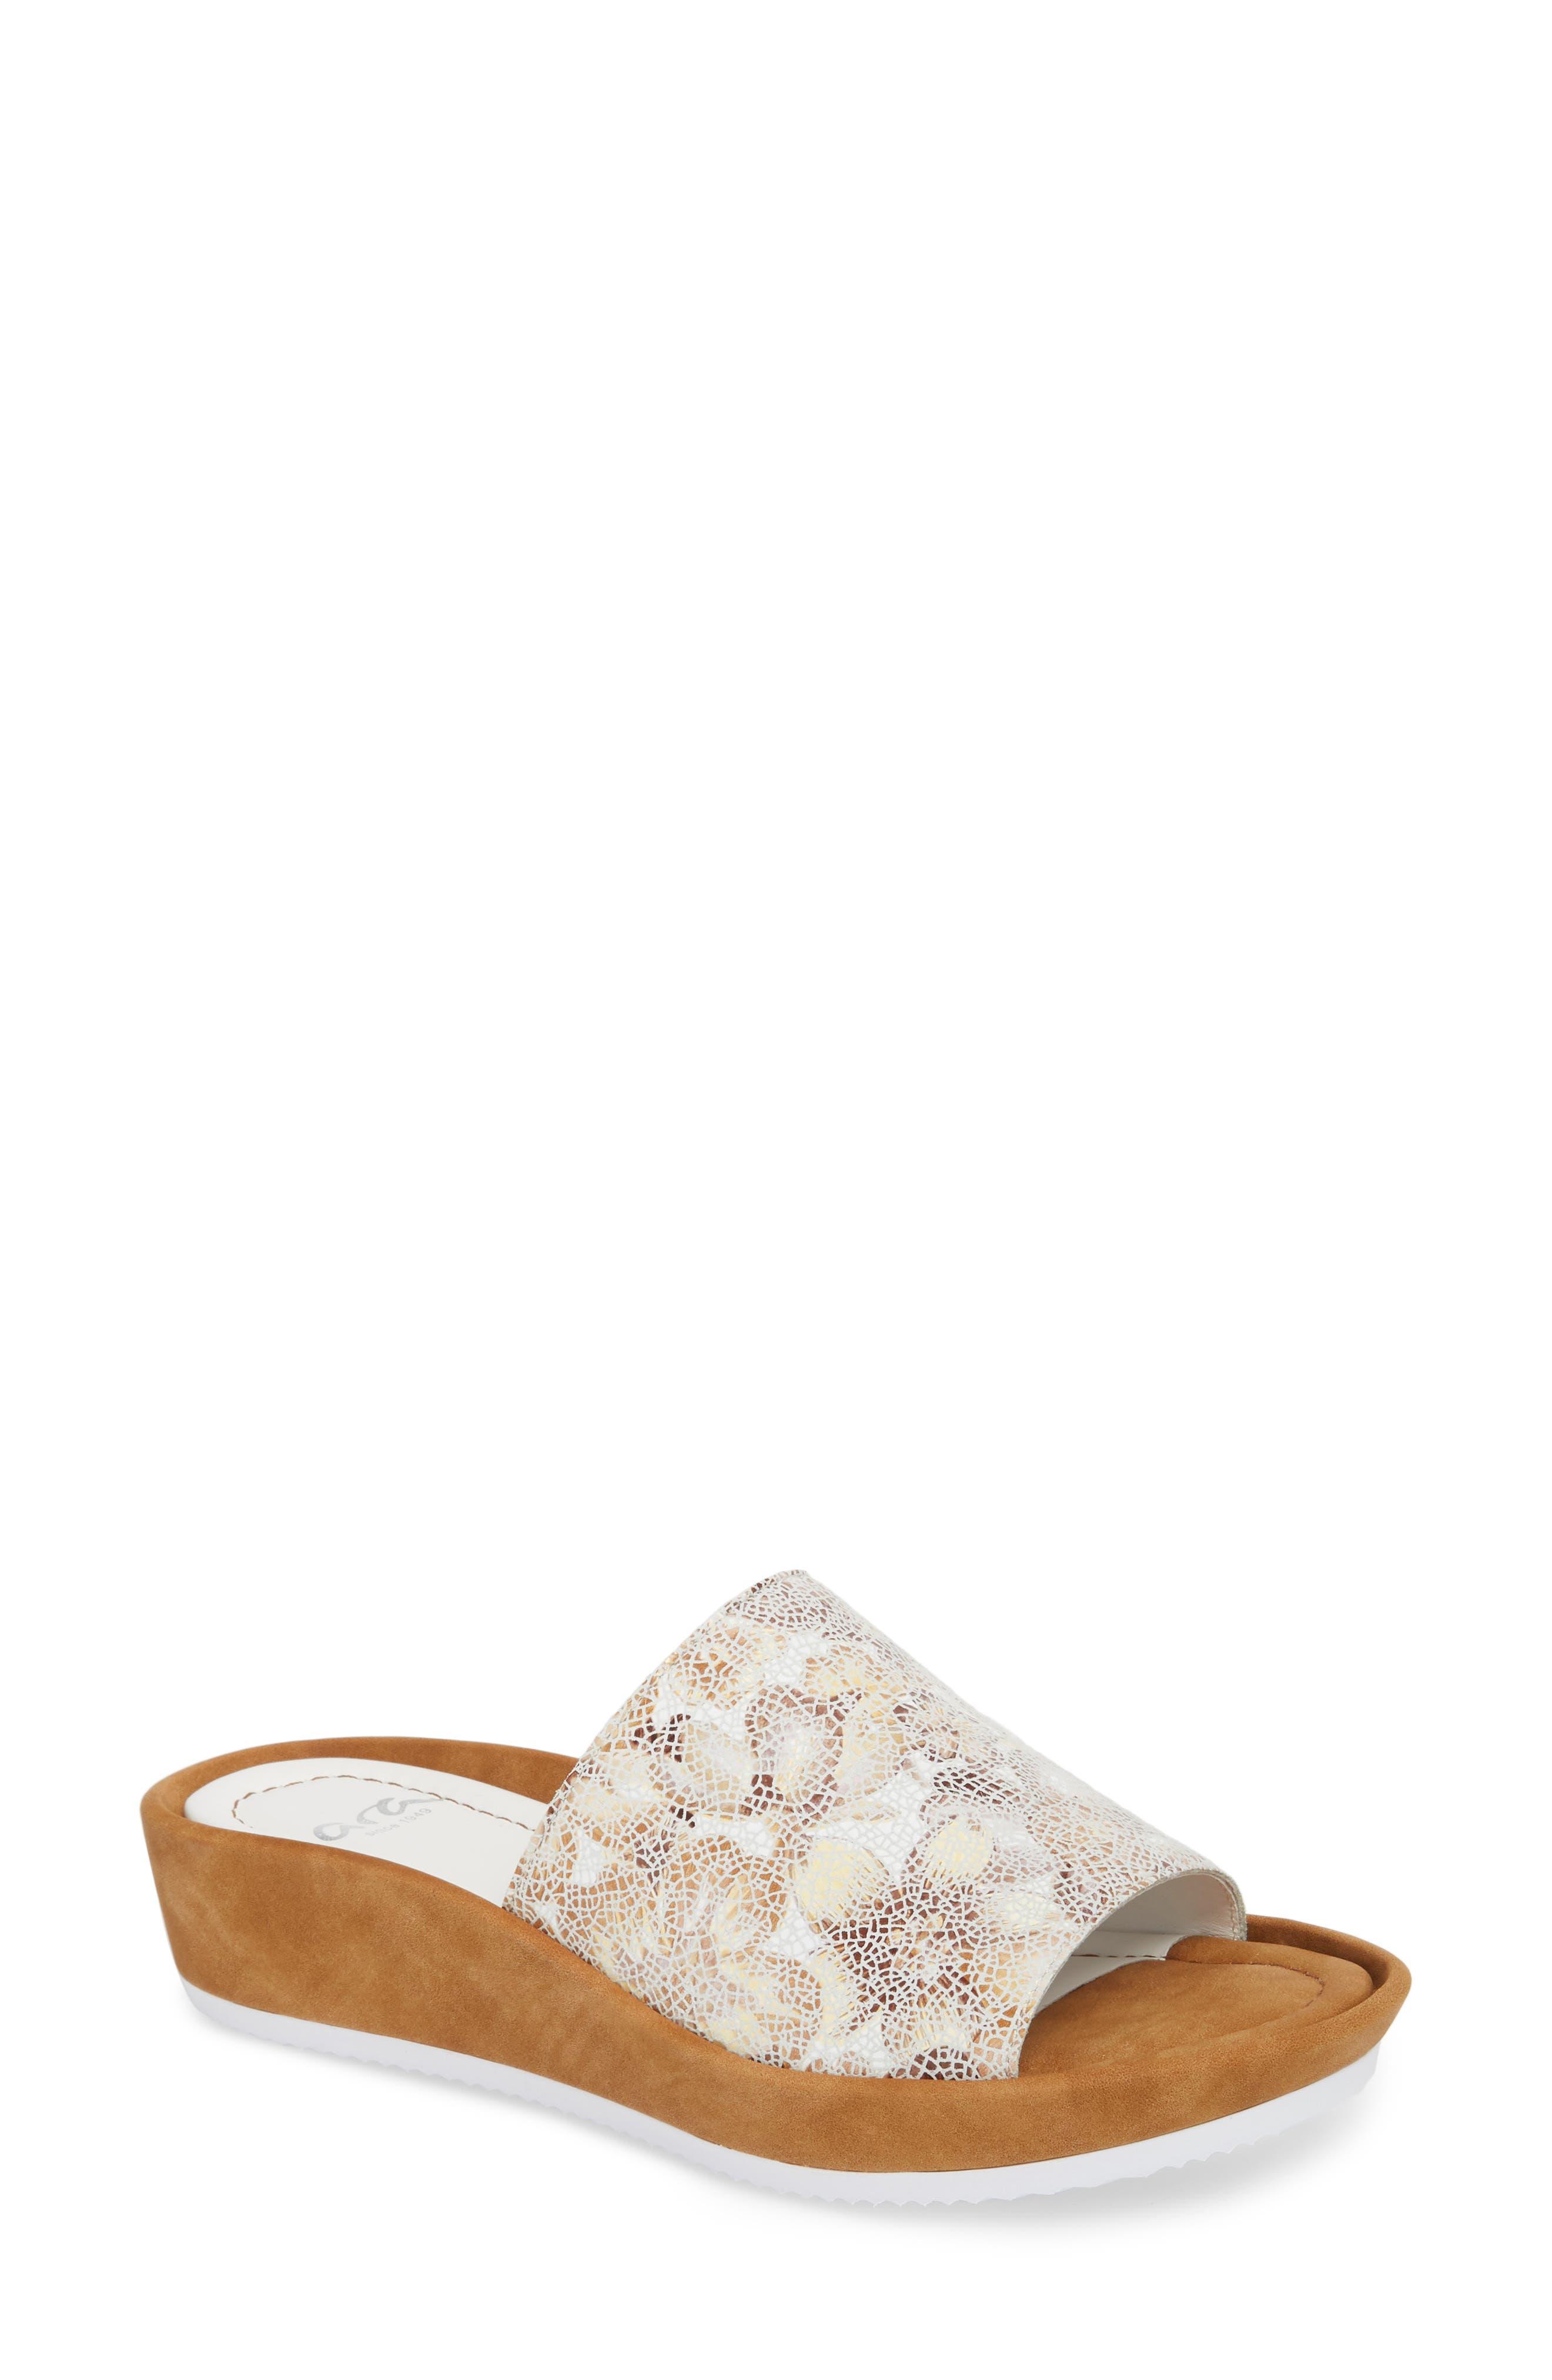 Tania Platform Wedge Slide Sandal,                             Main thumbnail 1, color,                             Taupe Leather